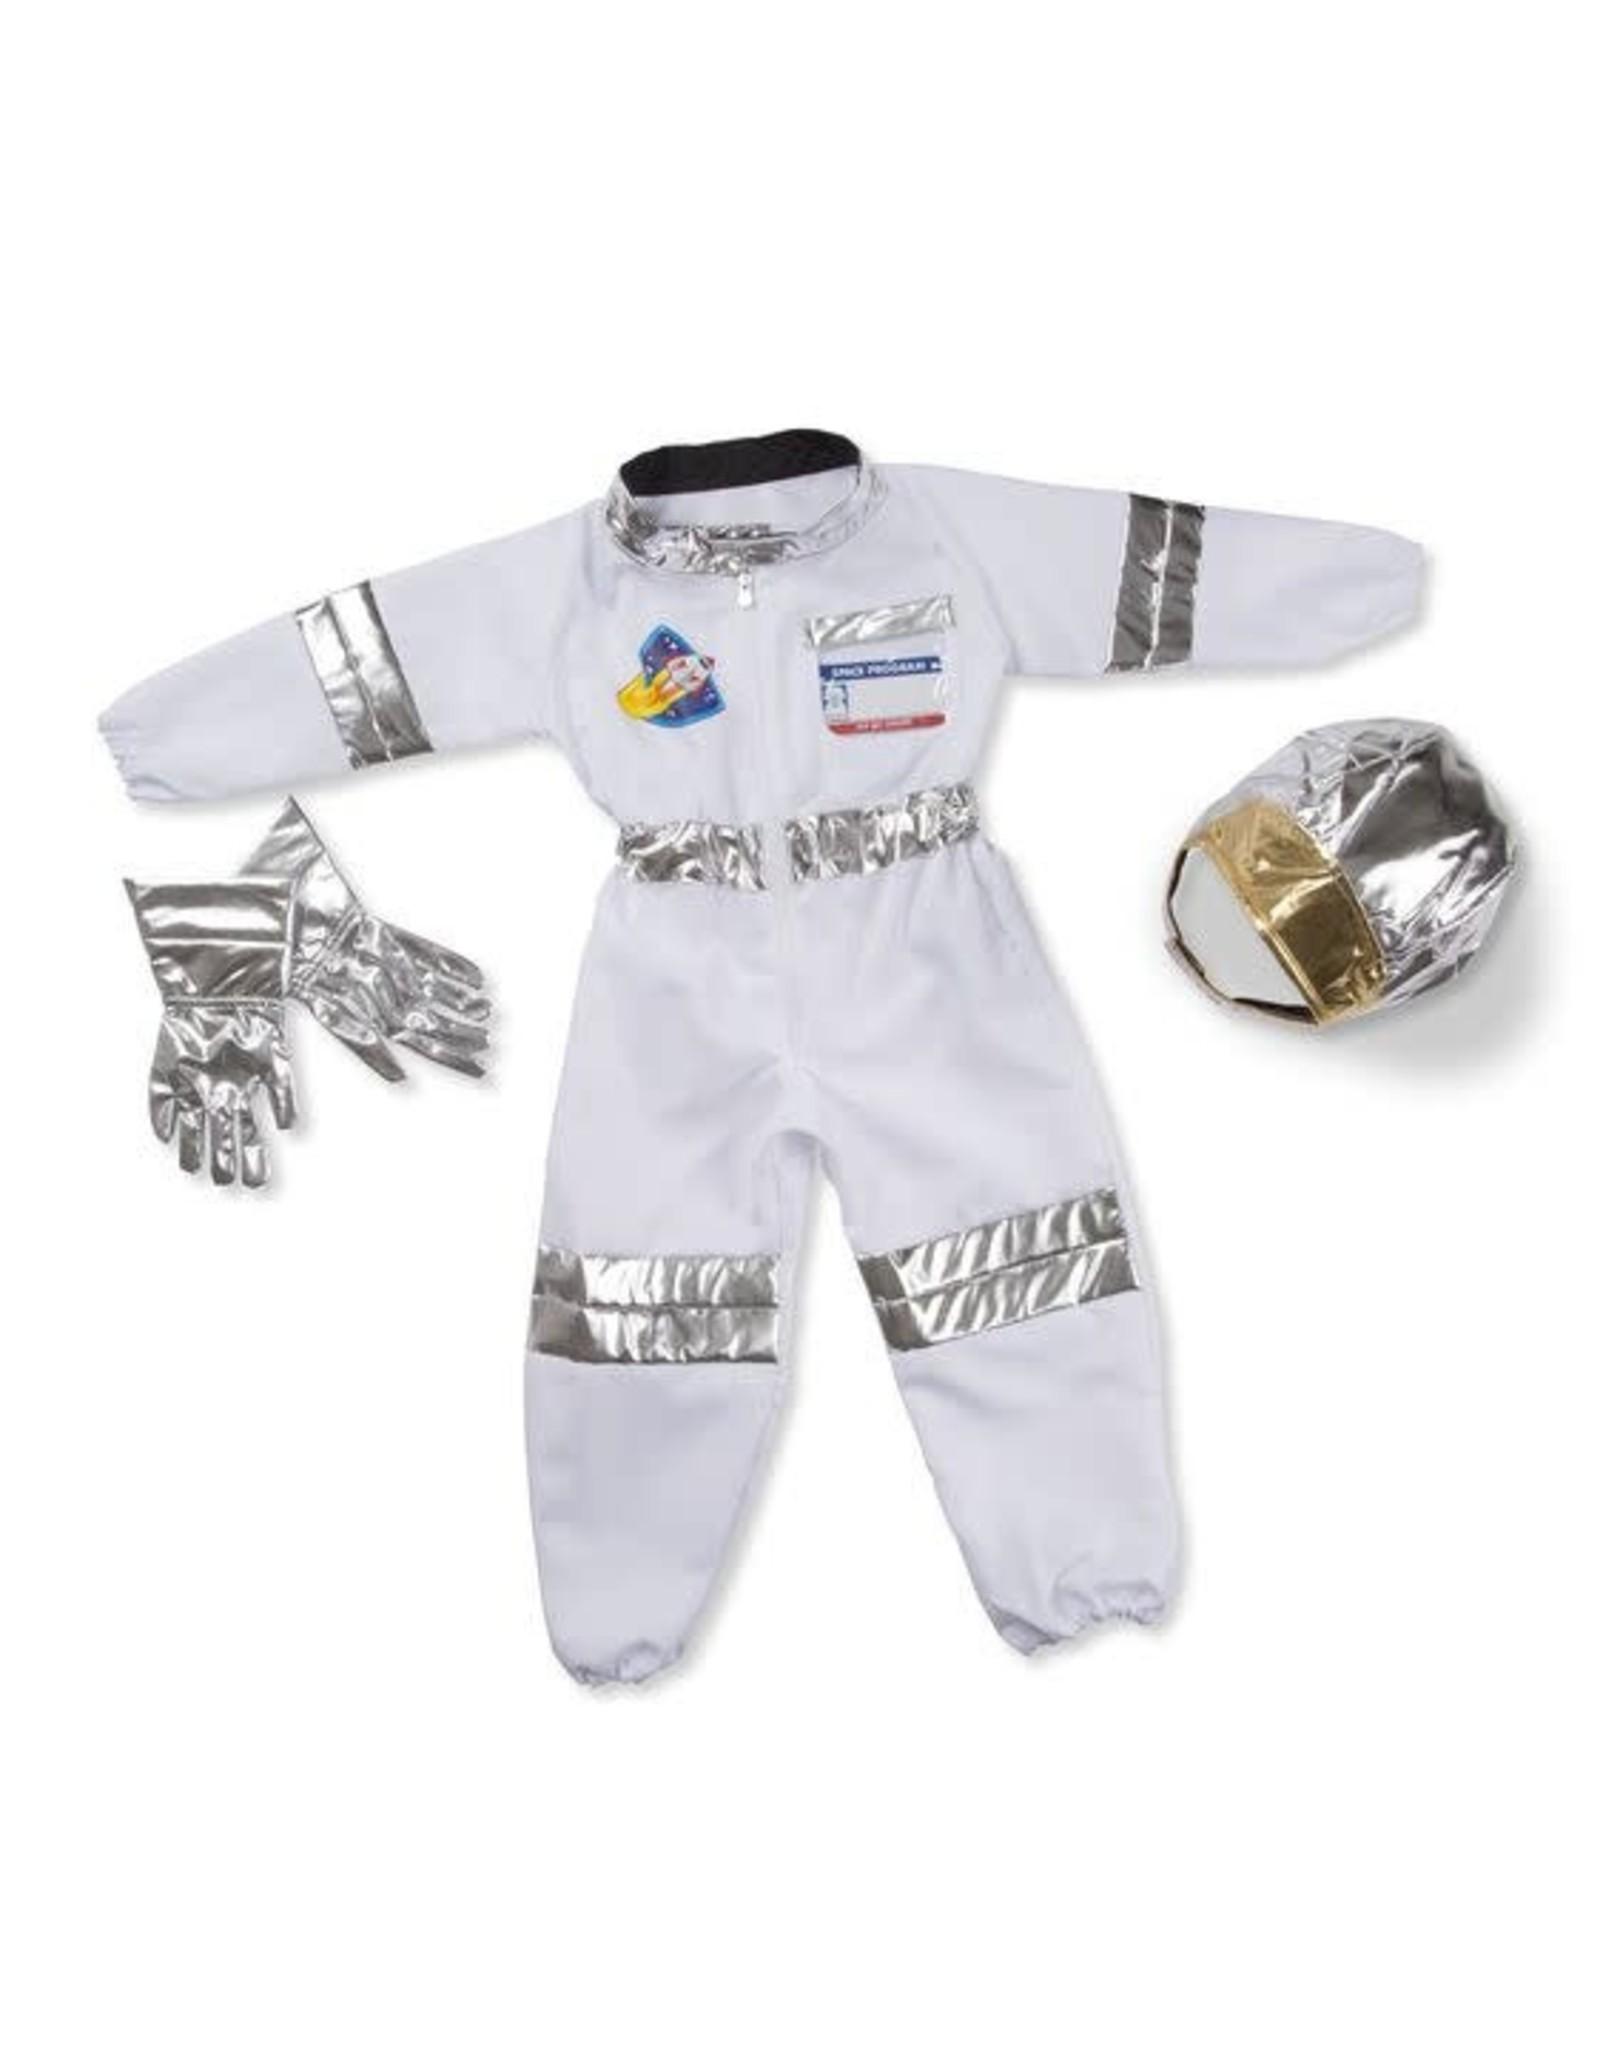 Melissa & Doug Astronaut Costume ages 3-6